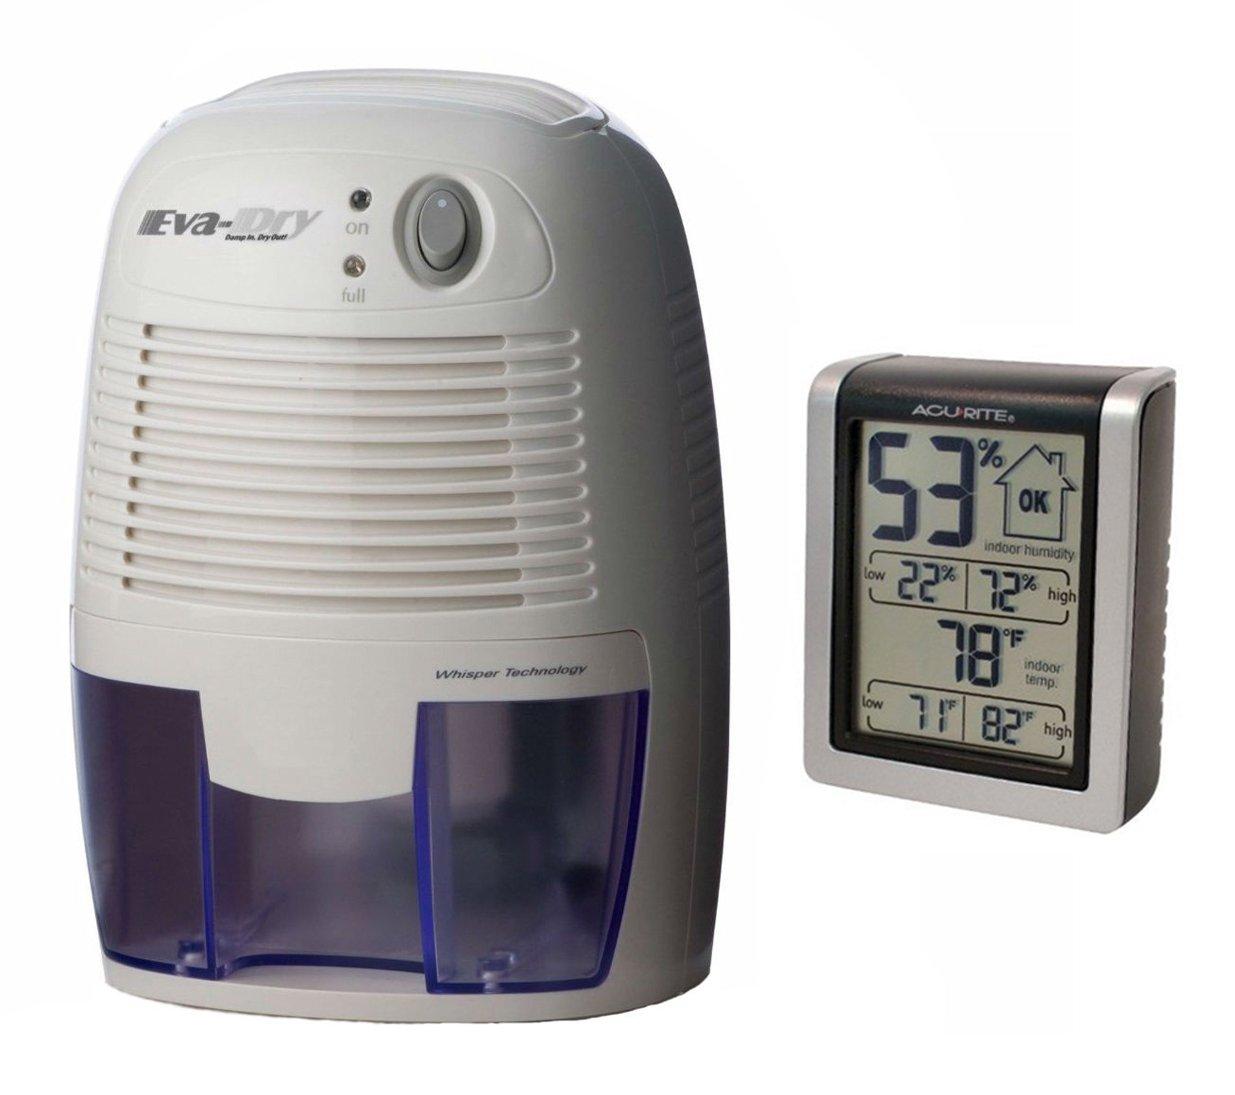 Eva-dry Edv-1100 Electric Petite Dehumidifier + AcuRite 00613 Indoor Humidity Monitor